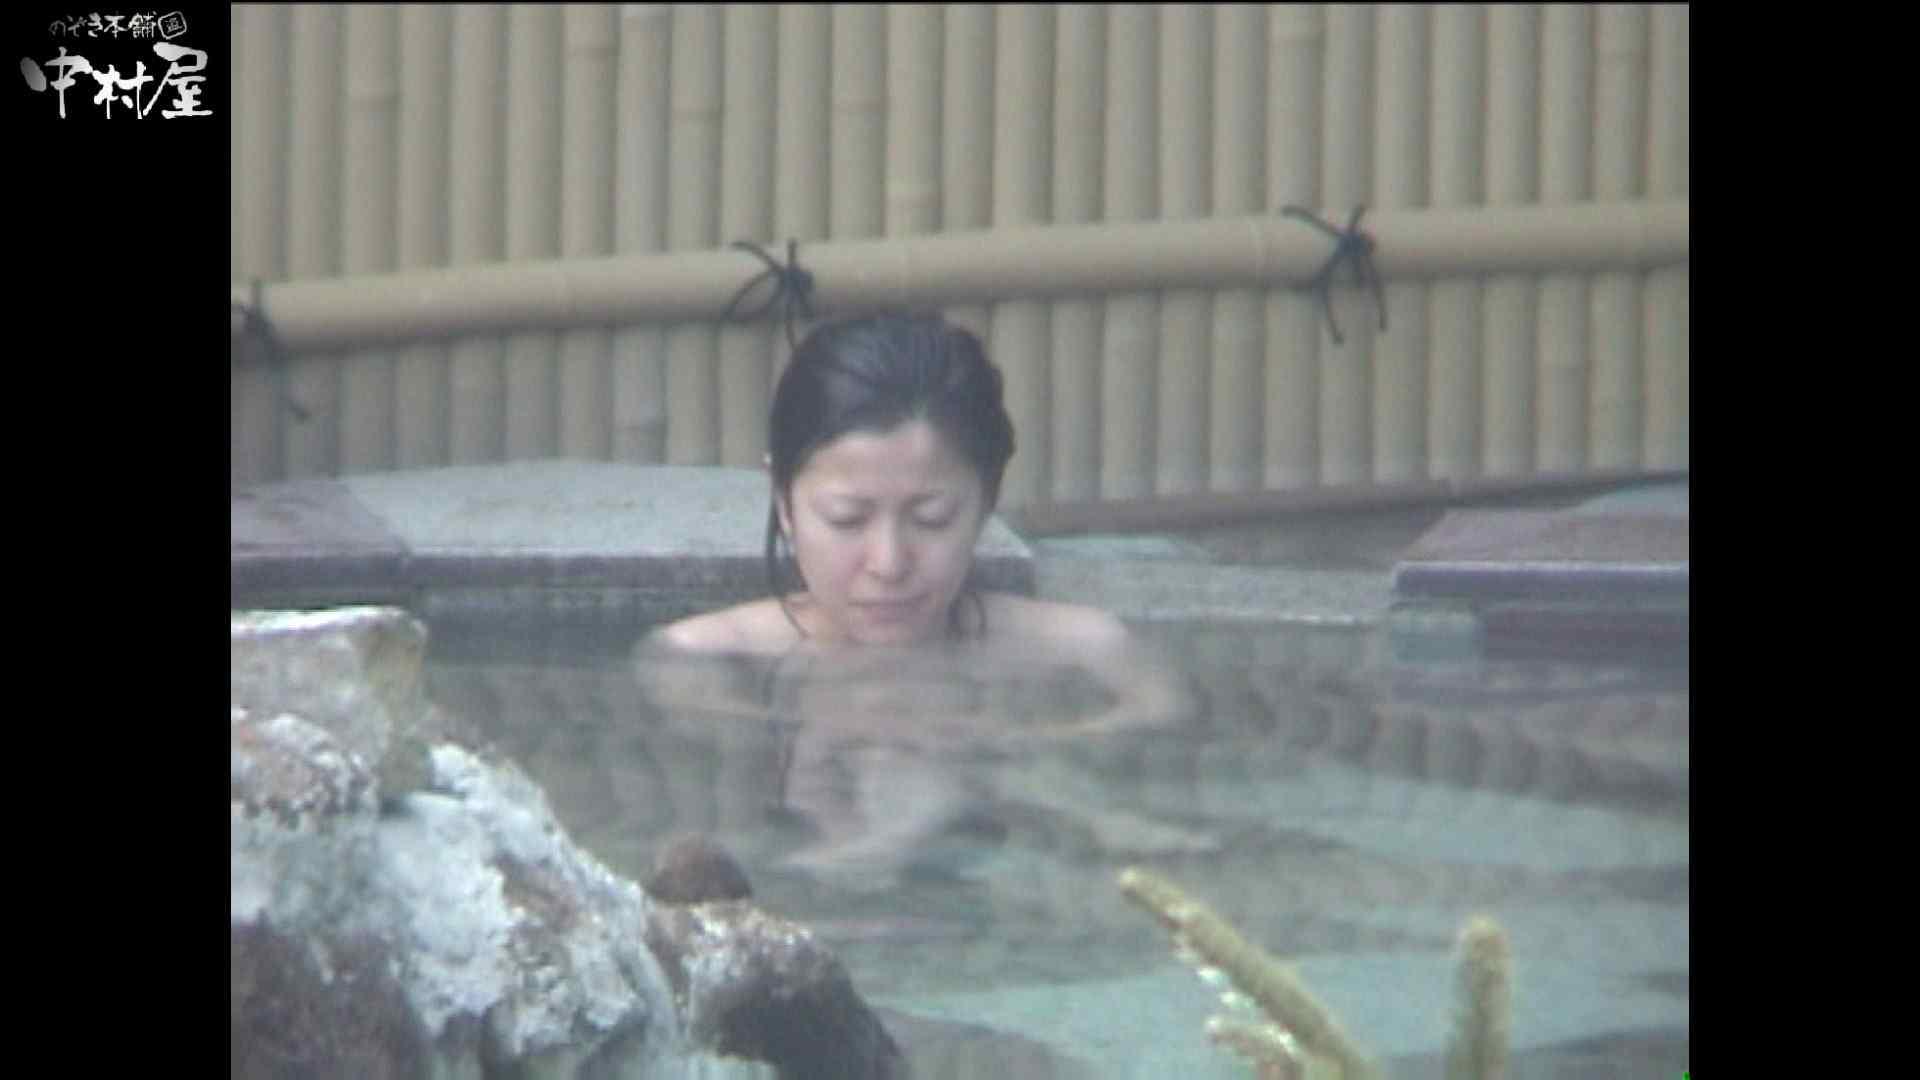 Aquaな露天風呂Vol.986 盗撮  94連発 78